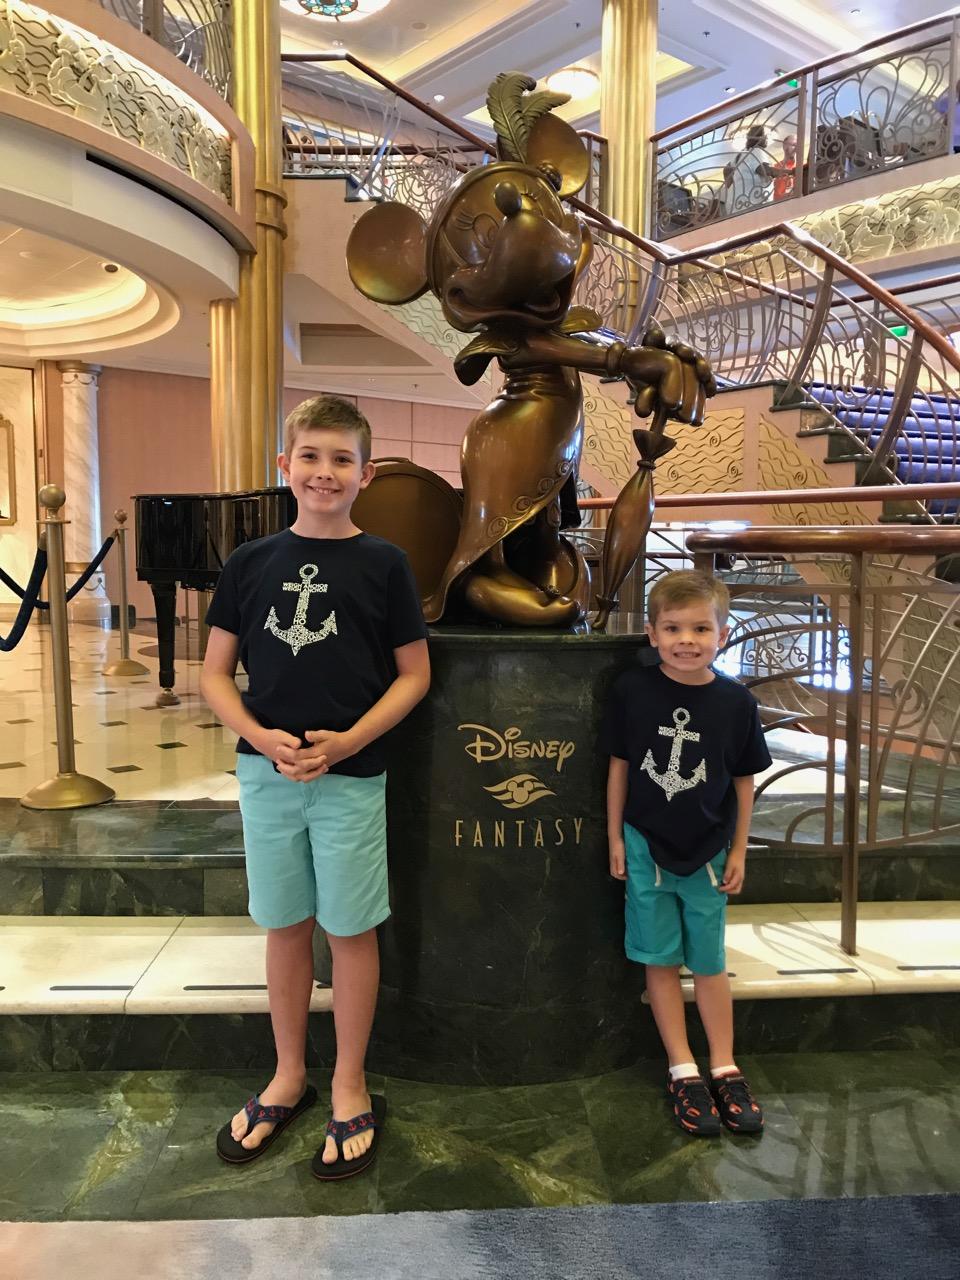 Disney Fantasy Minnie Statue